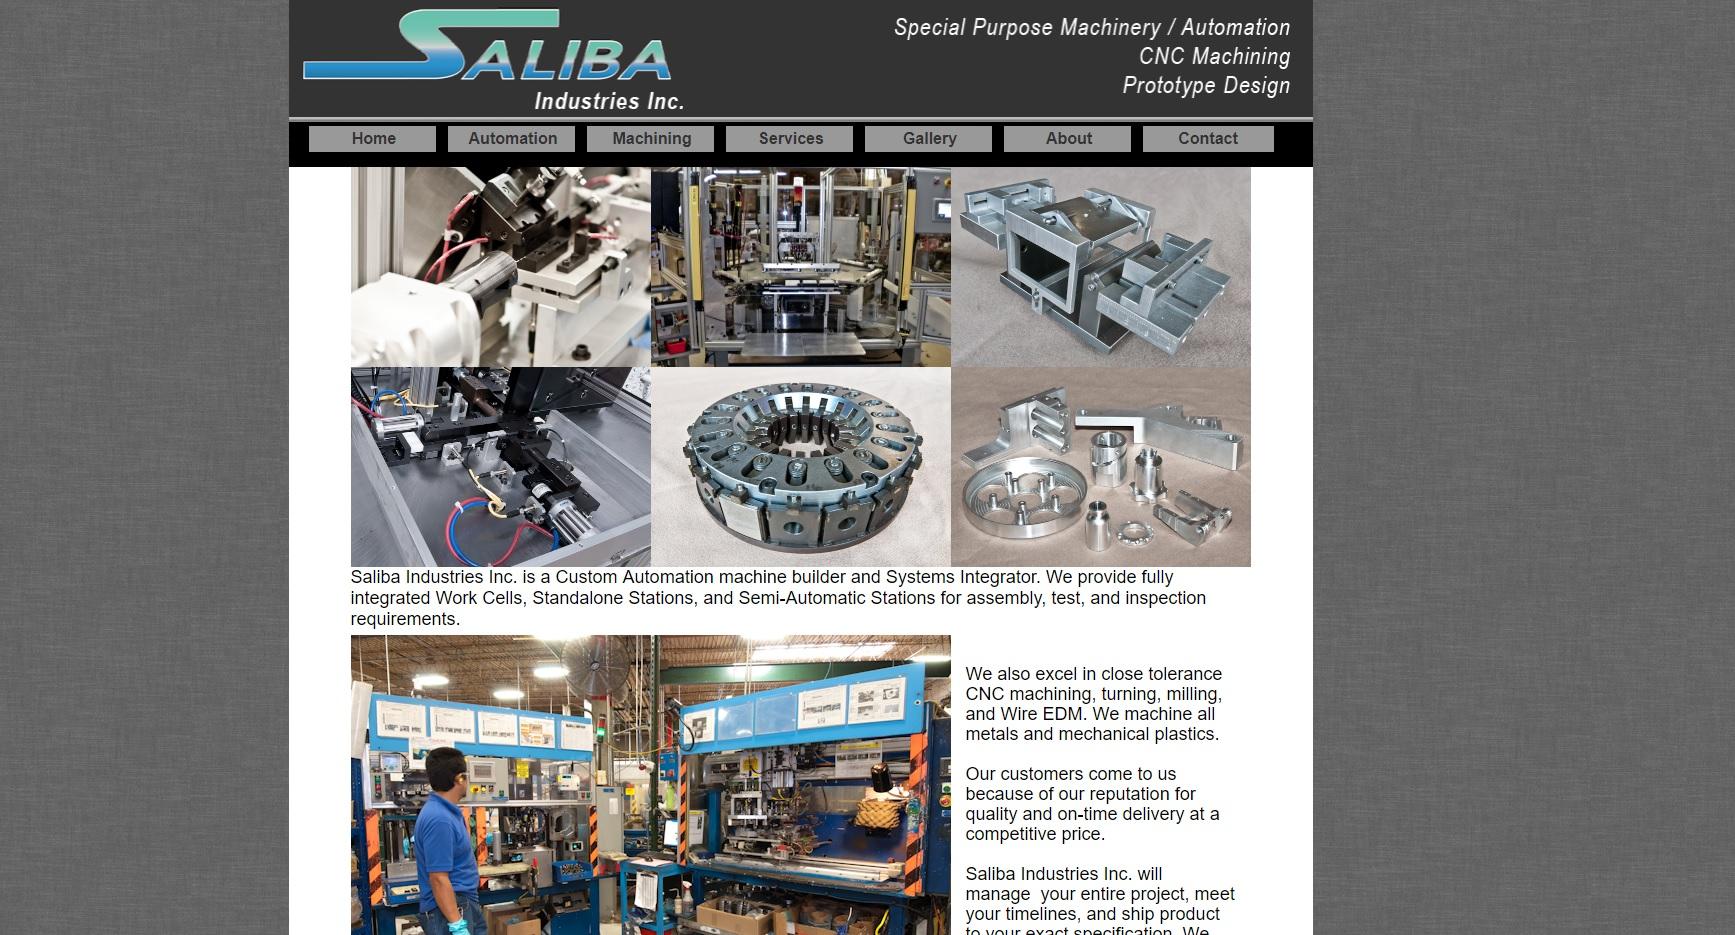 Saliba Industries